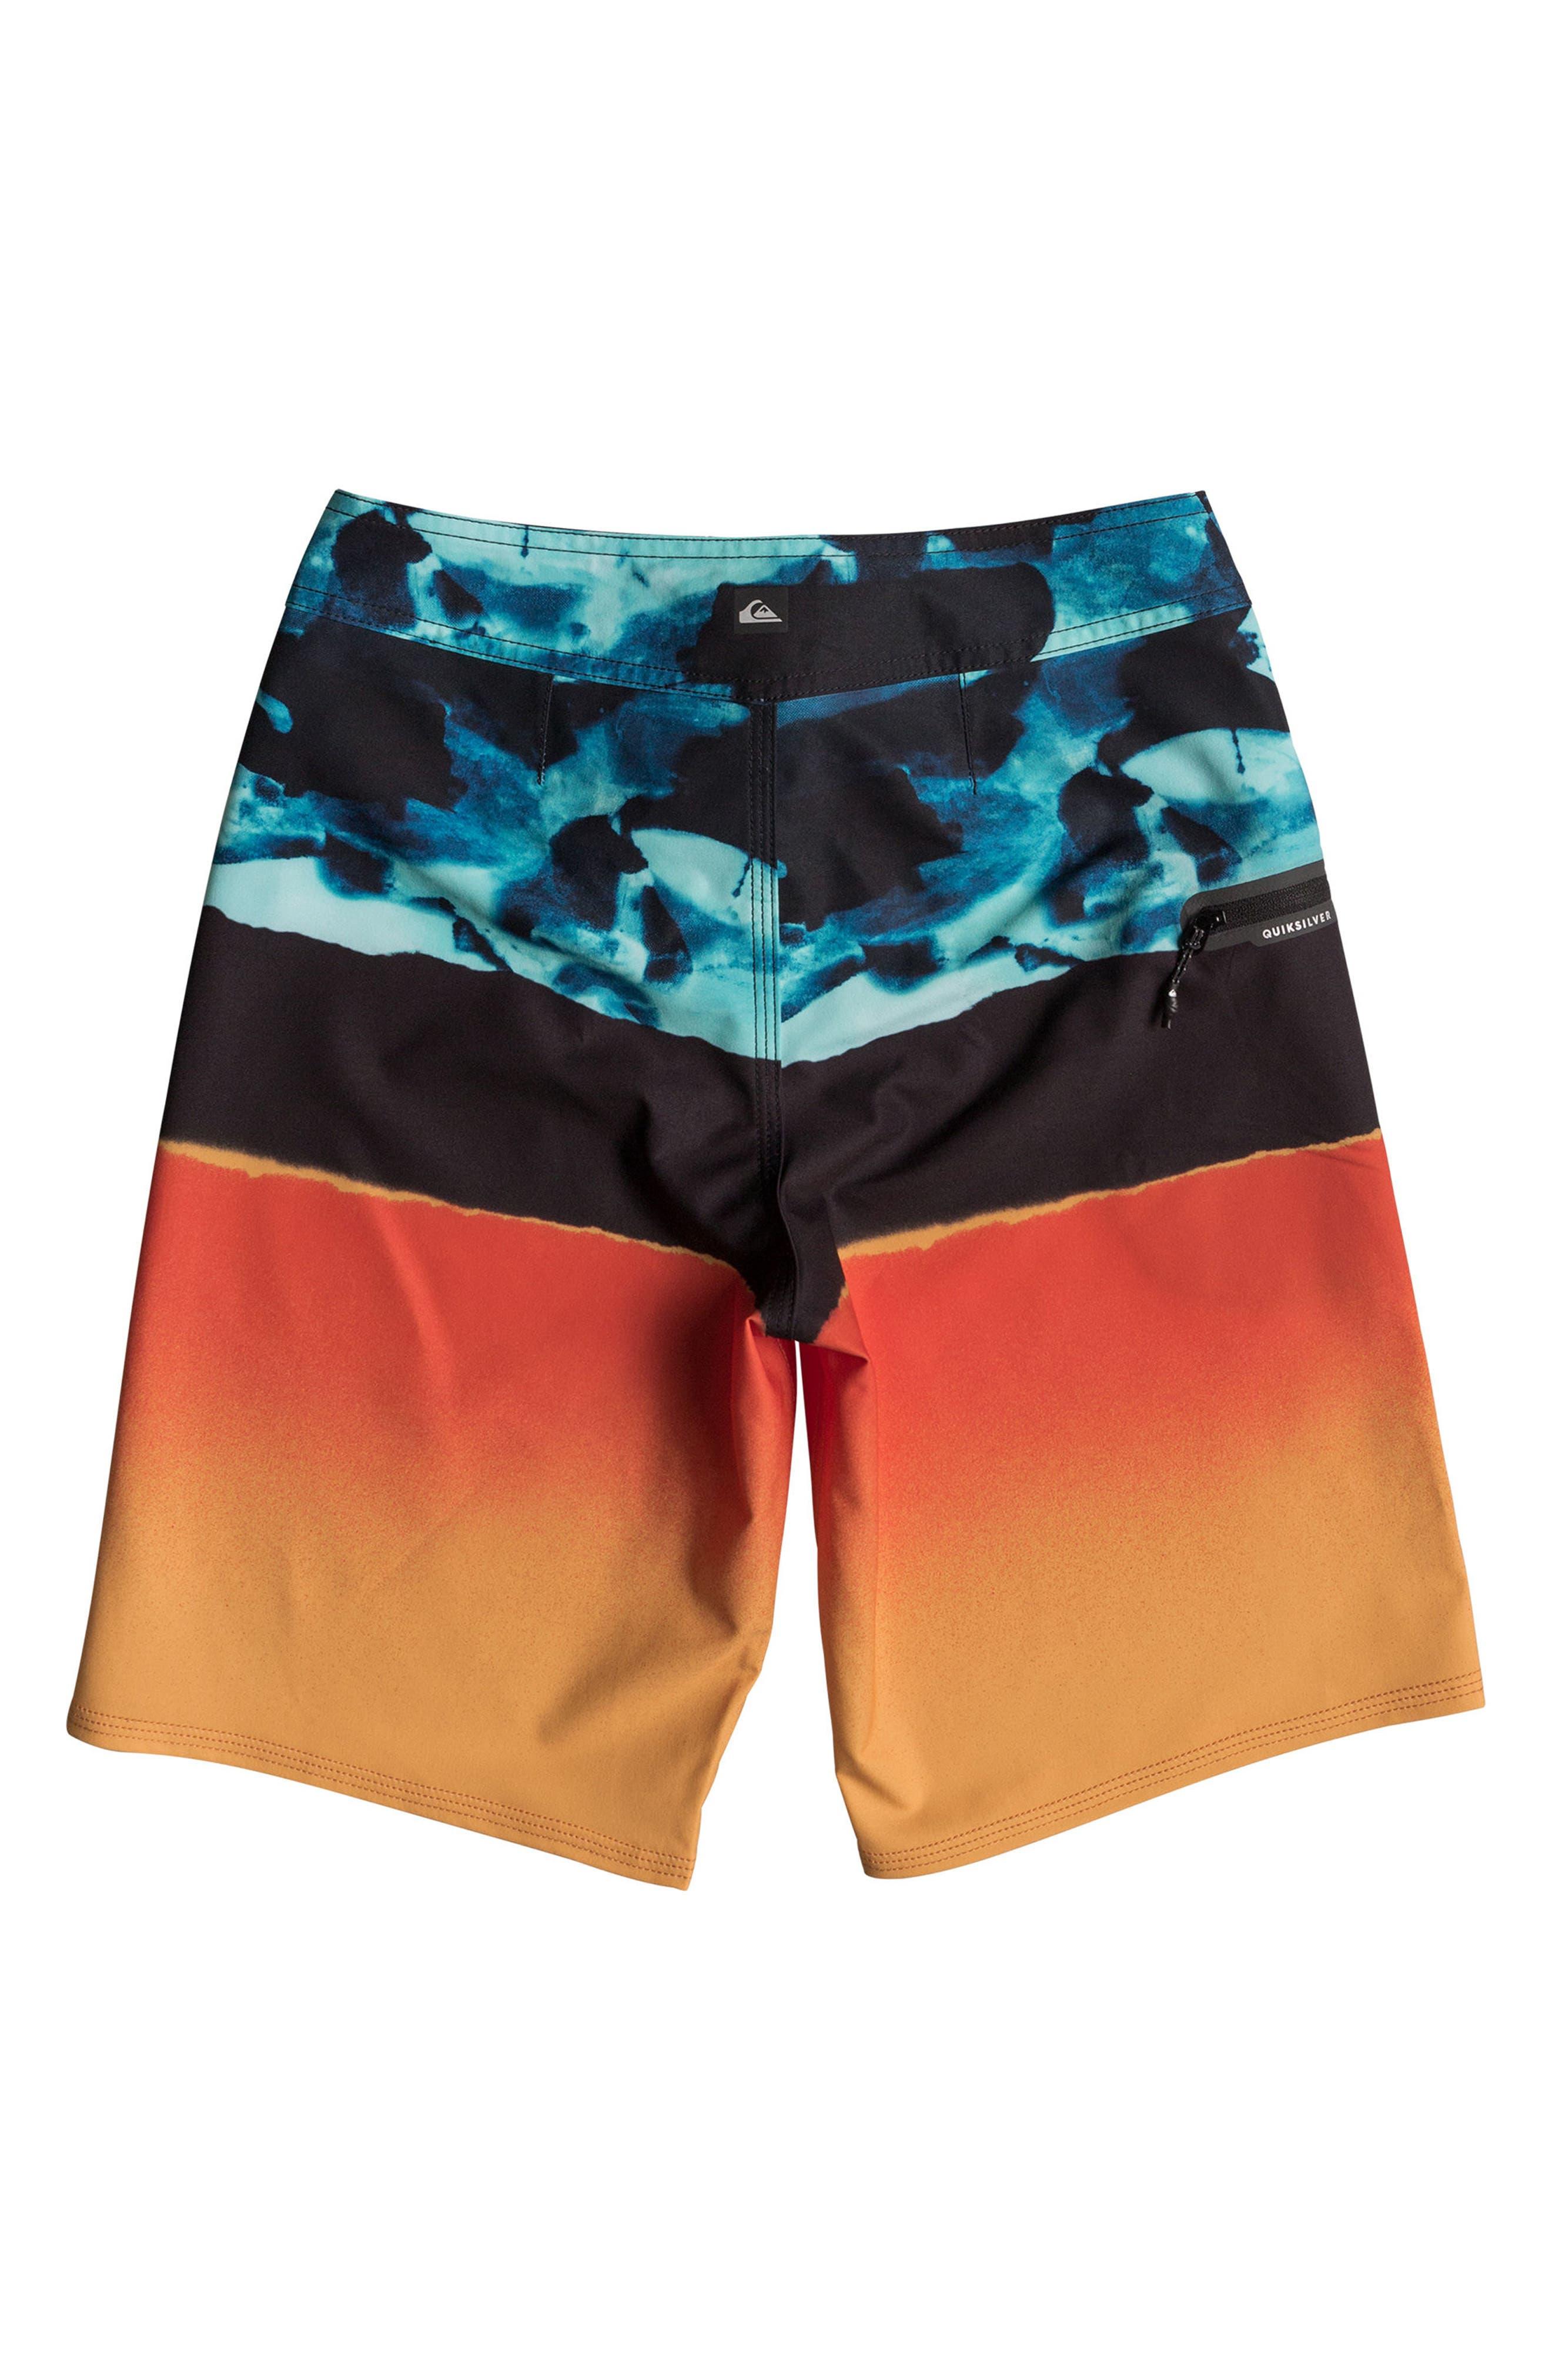 Blocked Resin Camo Board Shorts,                             Alternate thumbnail 2, color,                             407